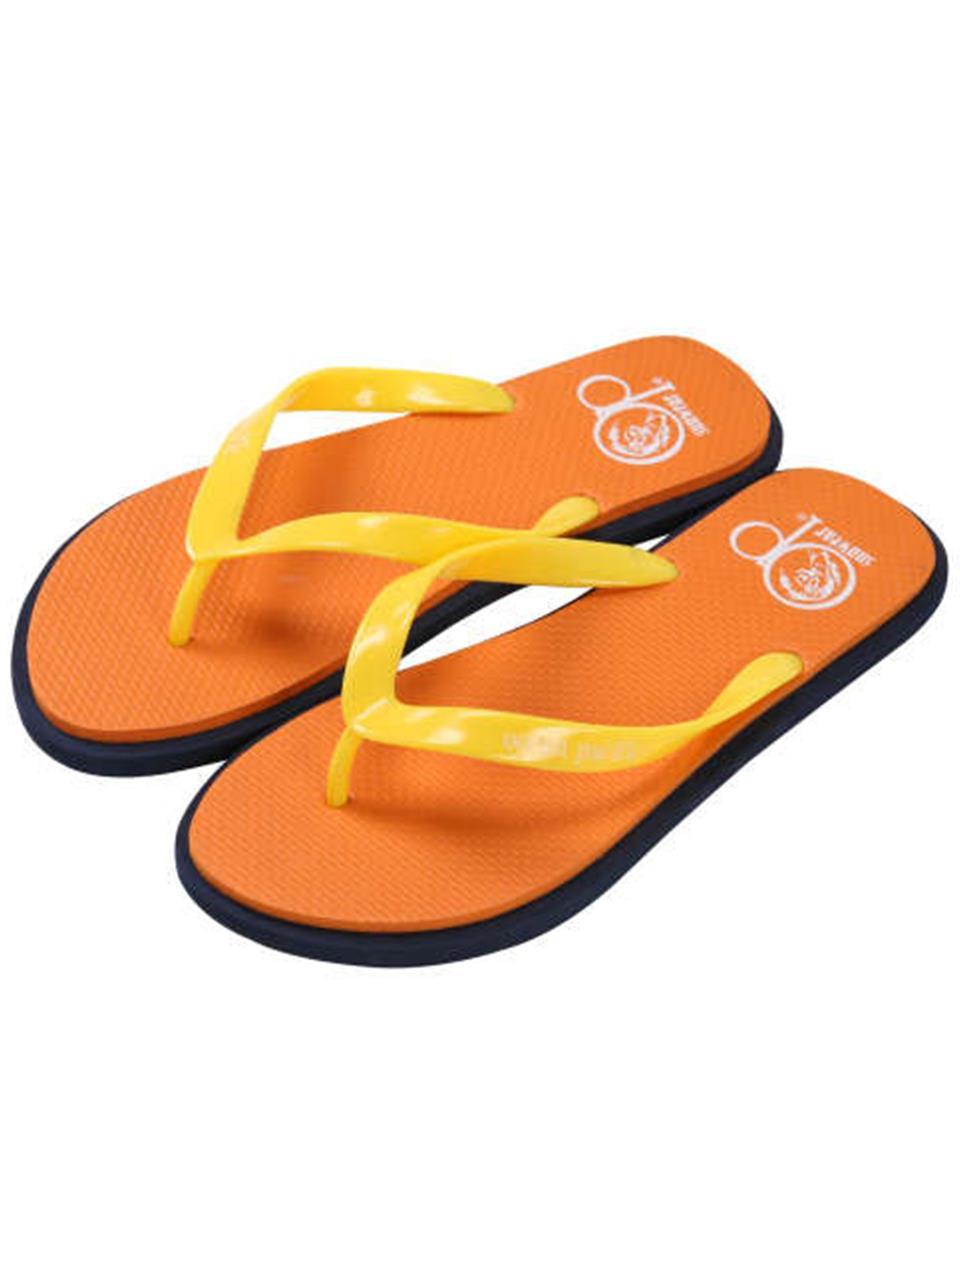 93f03f6d8 Ragtime  Beach sandal big size men B sun OP ocean Pacific C300730-03 ...